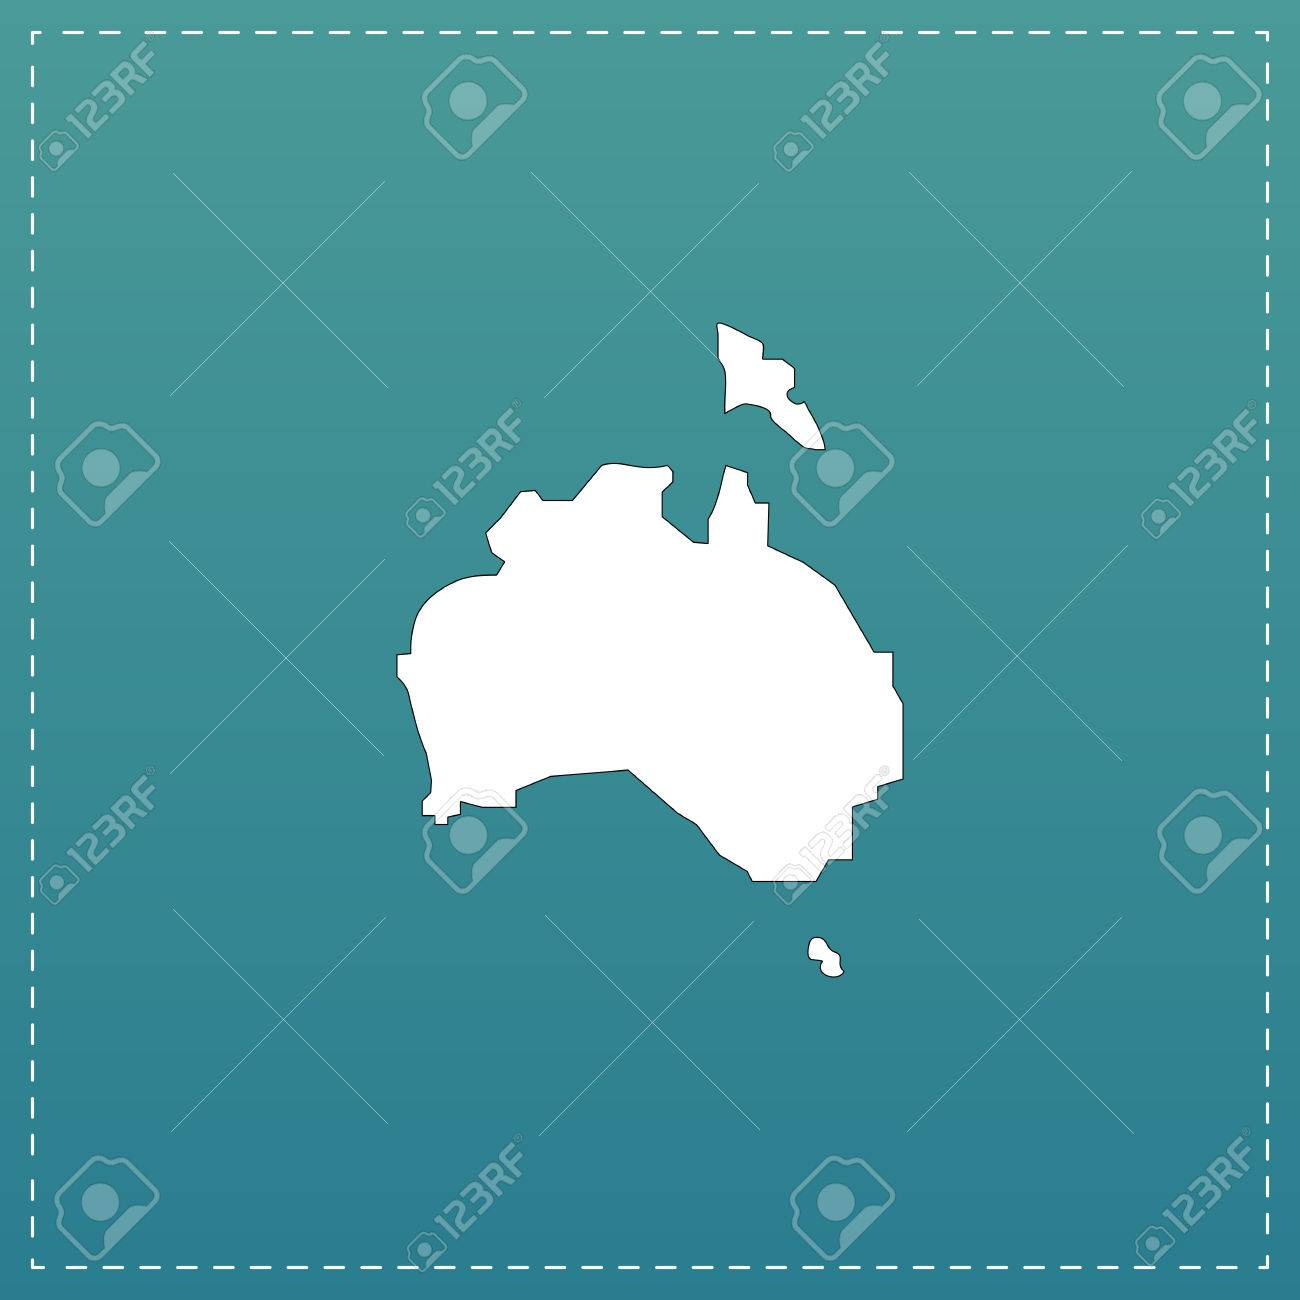 Australia Map In R.Australia Map White Flat Icon With Black Stroke On Blue Background